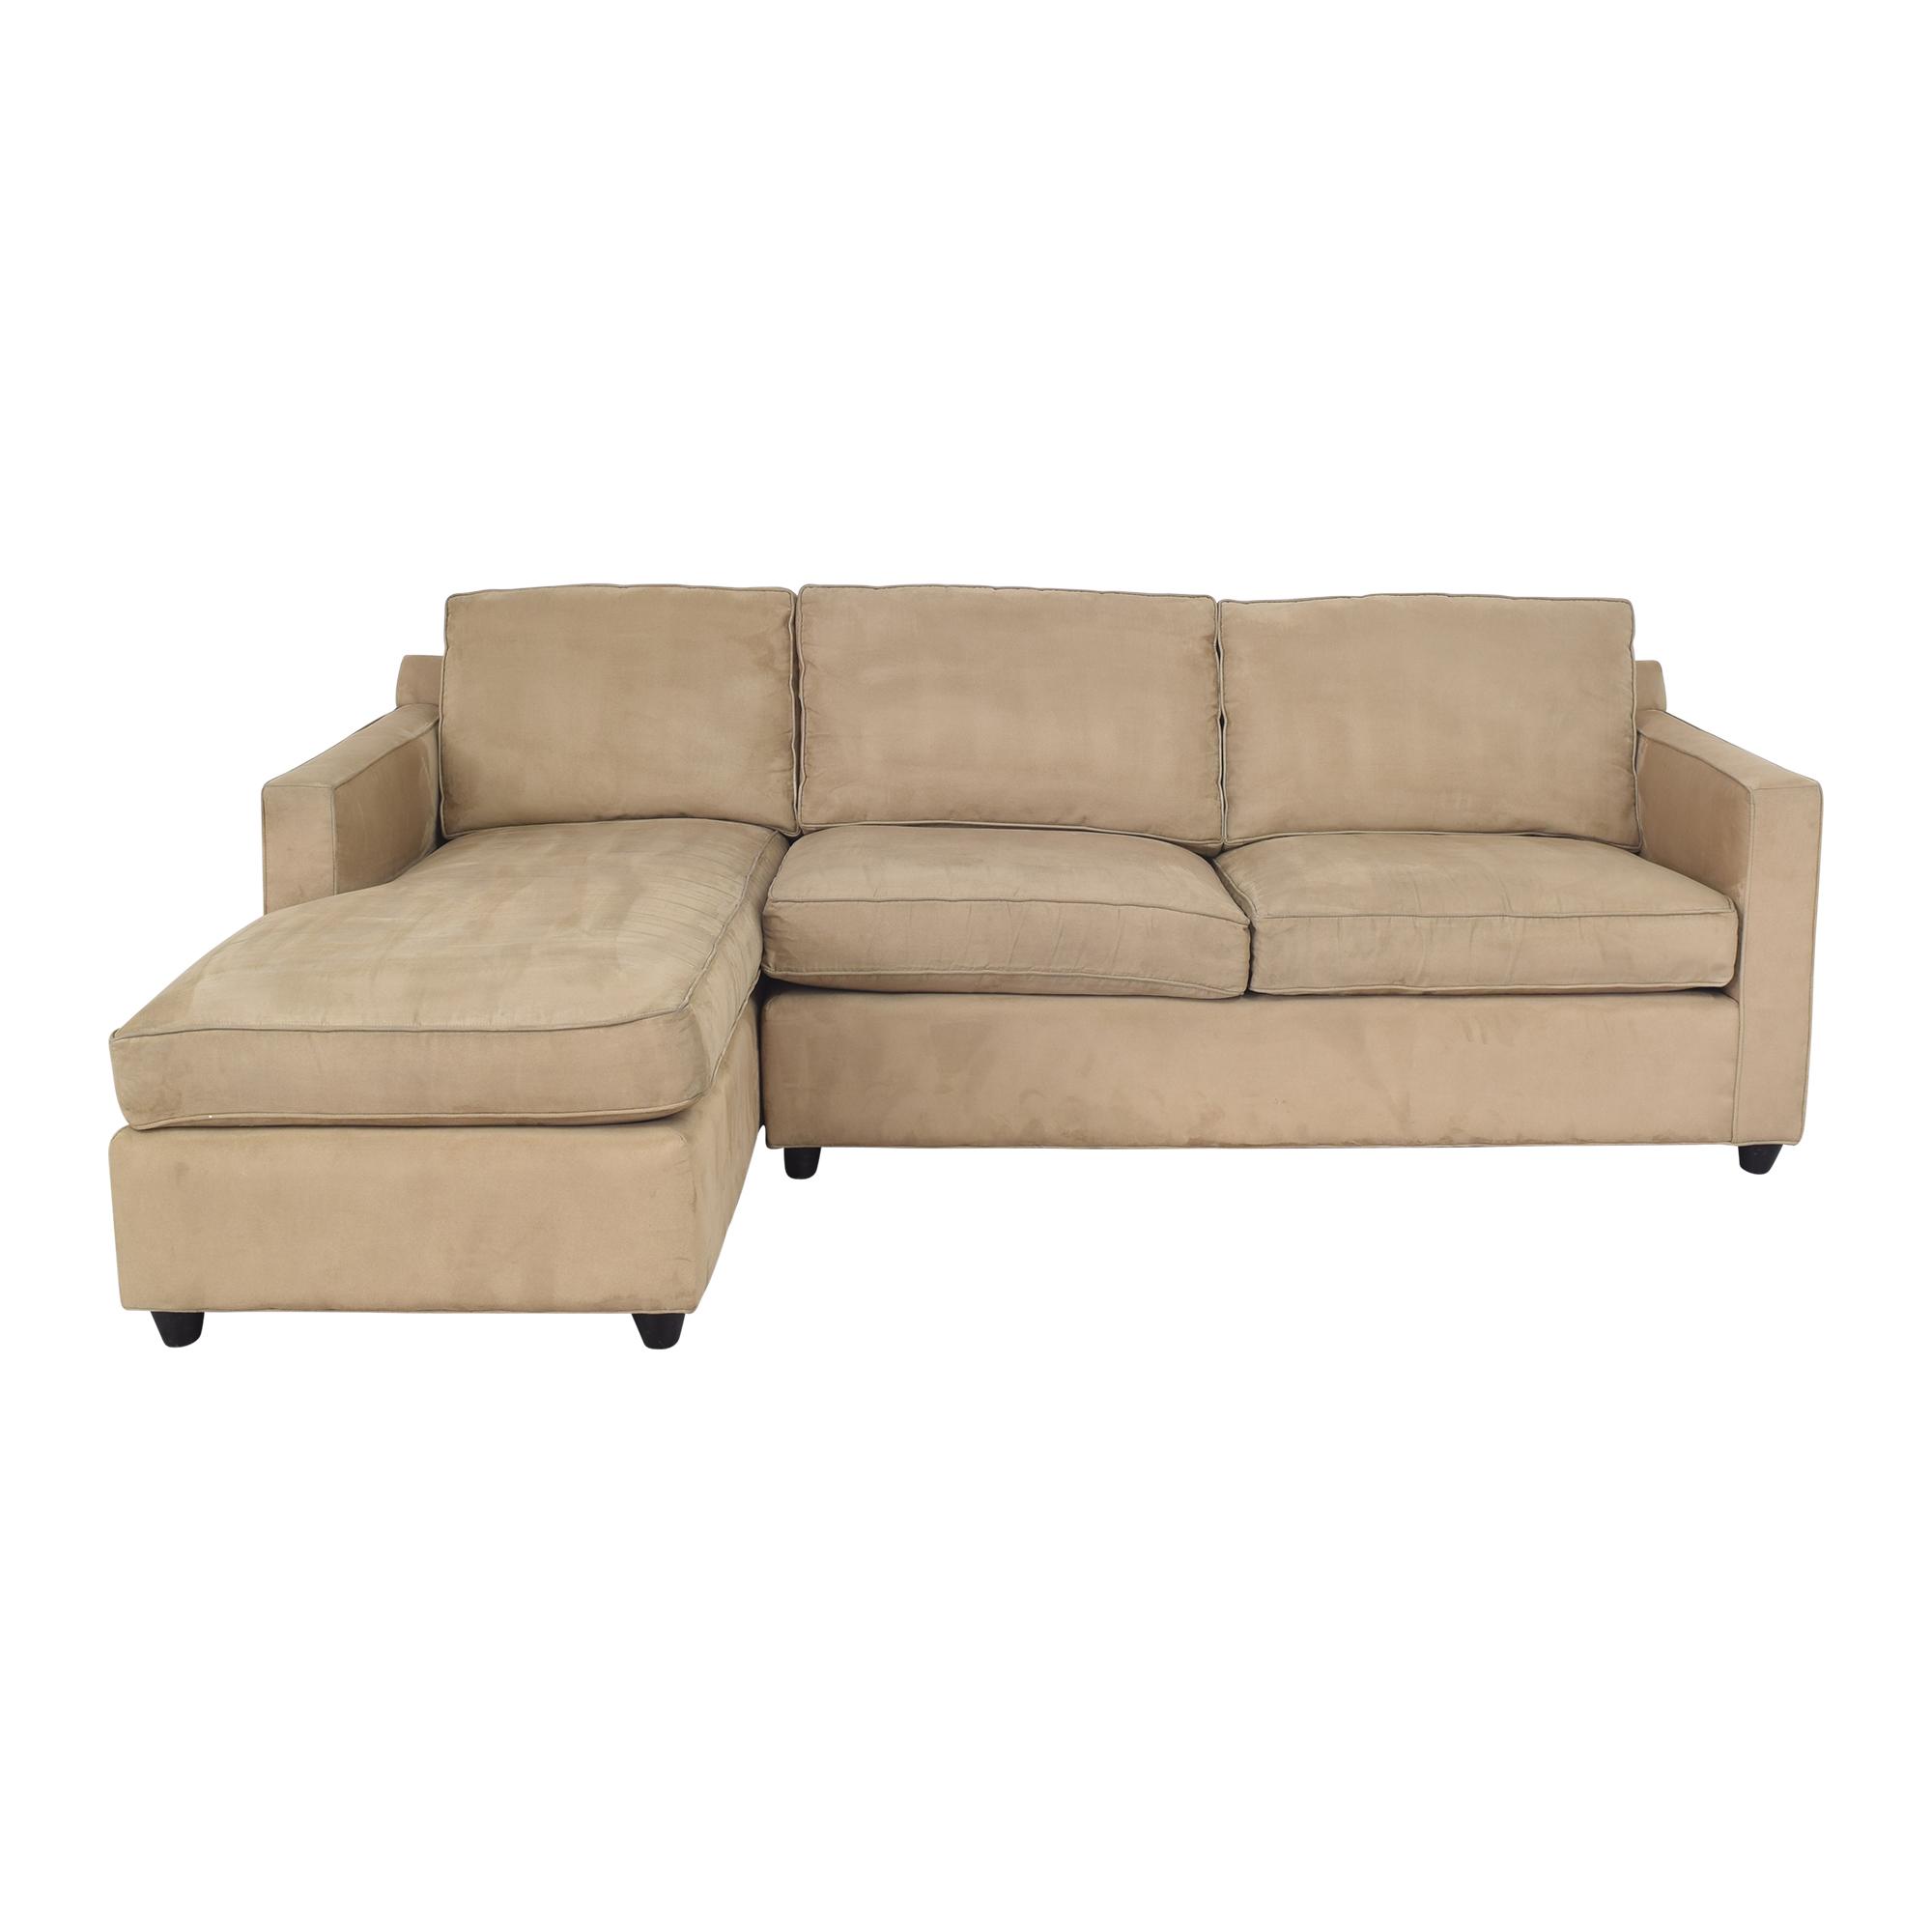 Crate & Barrel Crate & Barrel Barrett Chaise Sectional Sofa brown